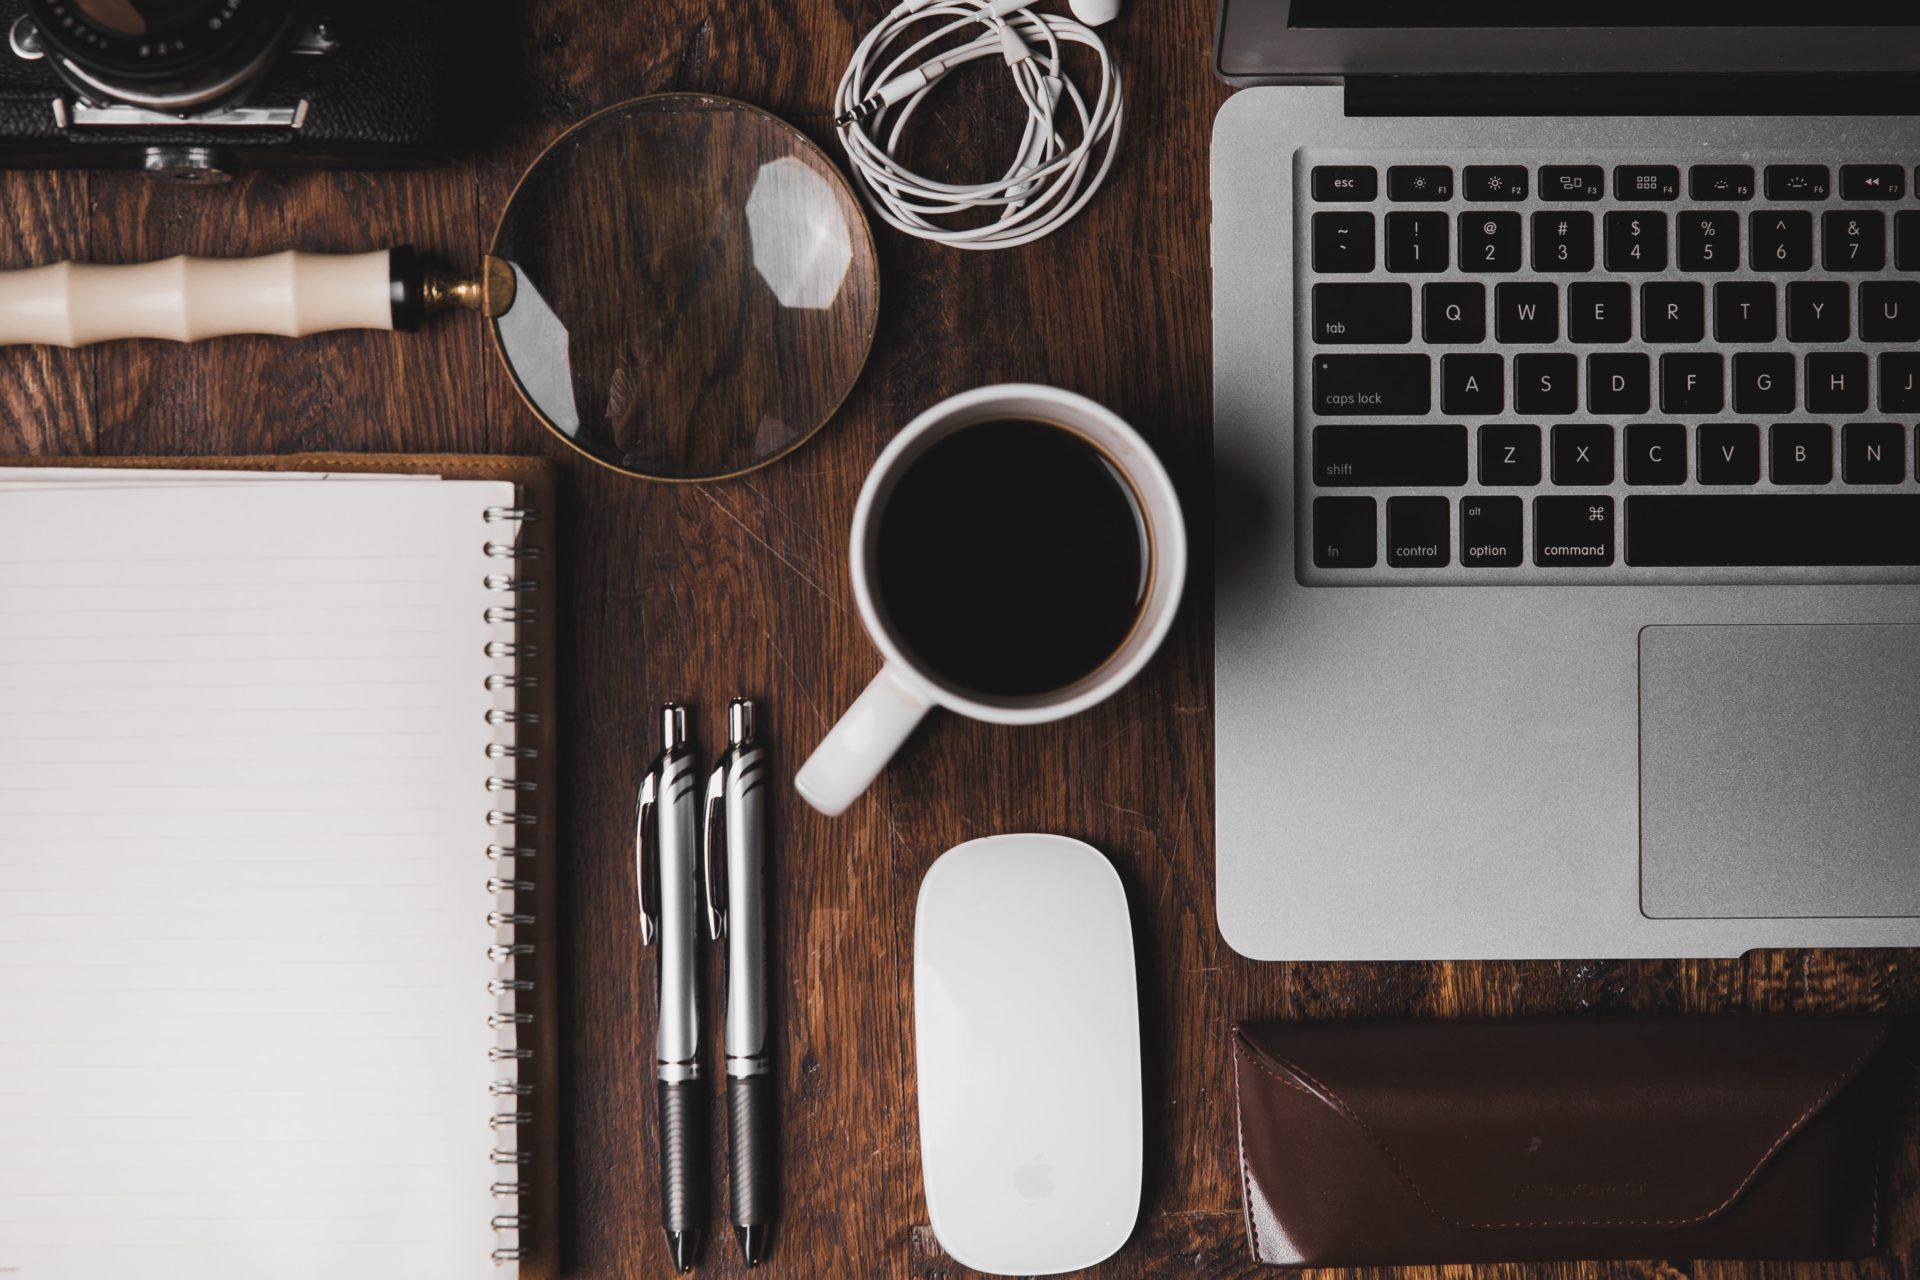 laptop, coffee, pencils, notebook